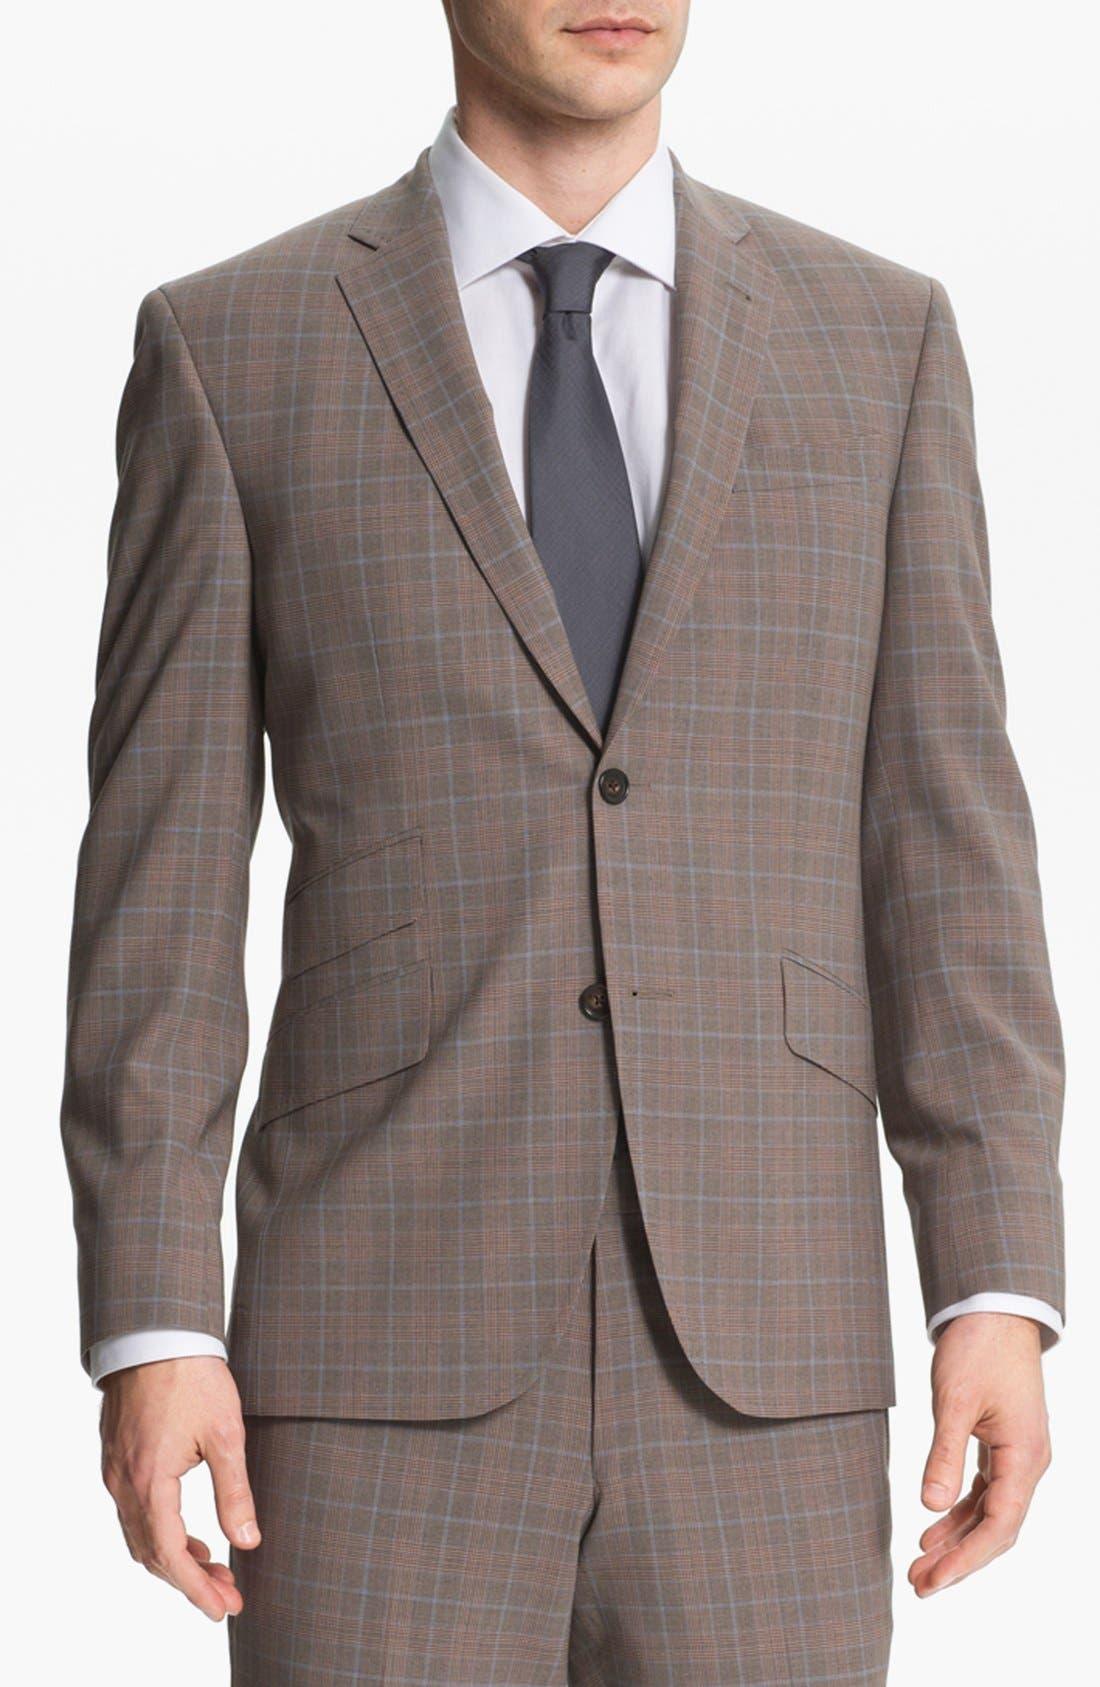 Alternate Image 1 Selected - Ted Baker London Trim Fit Plaid Suit